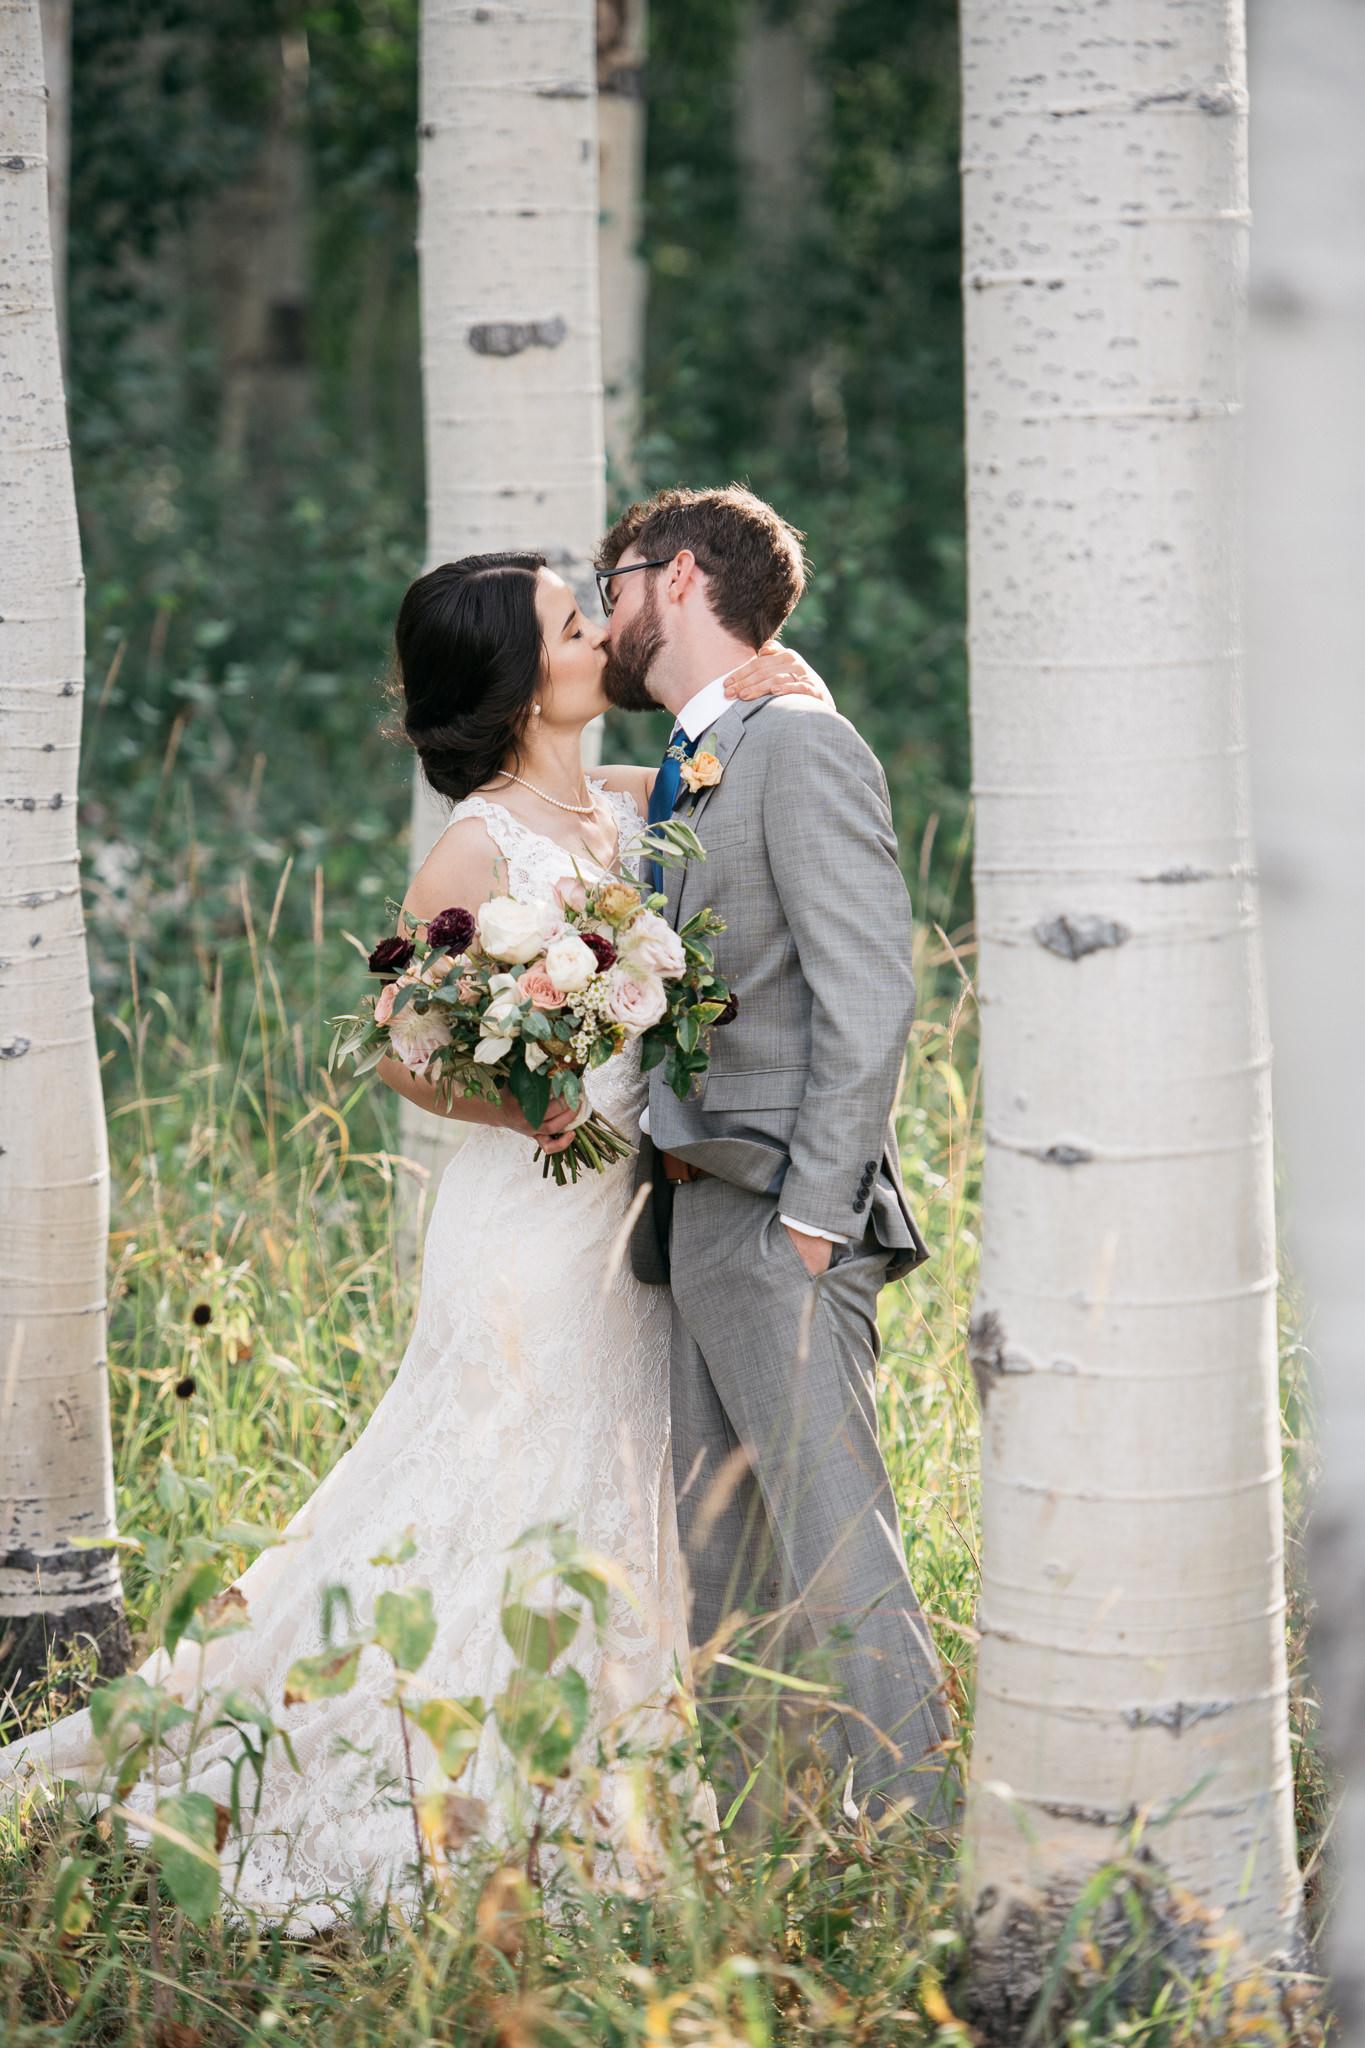 411_ONL_Kat_Nick_Wedding_Trevor_Hooper_Photo.jpg